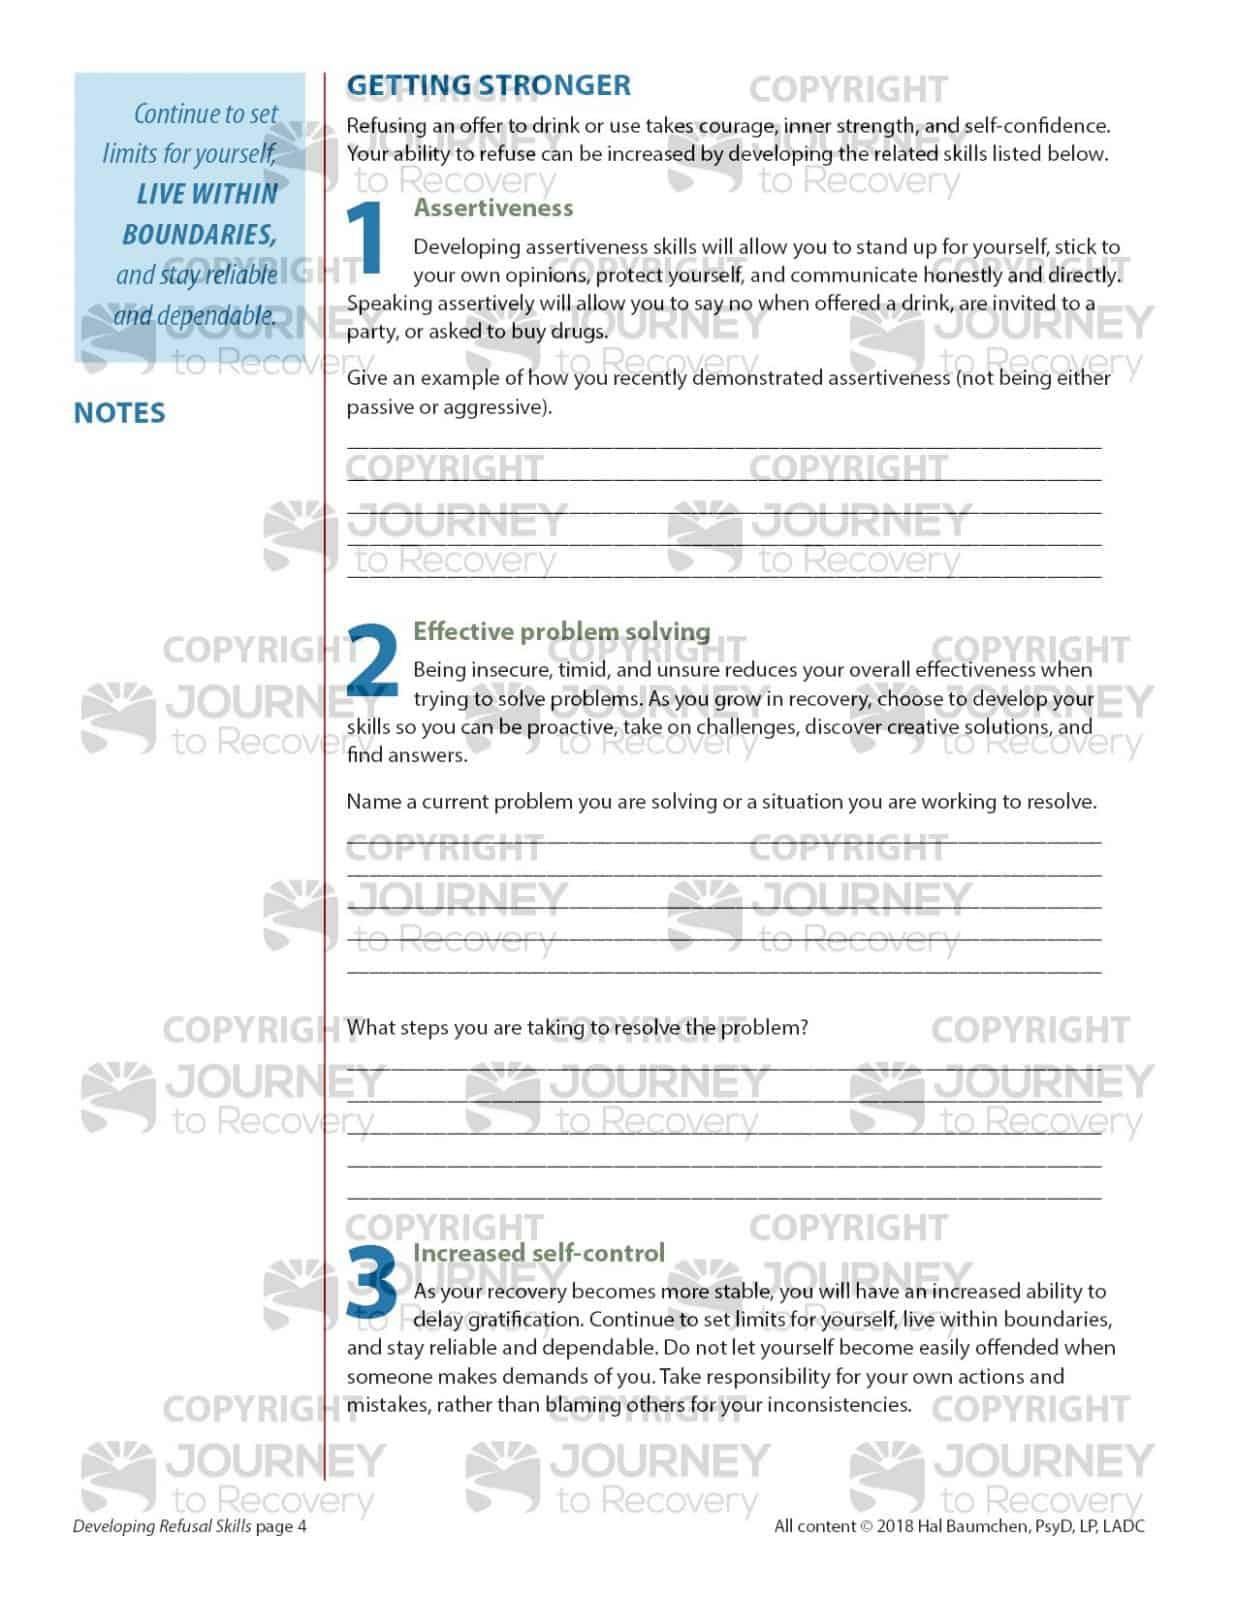 Developing Refusal Skills Cod Lesson